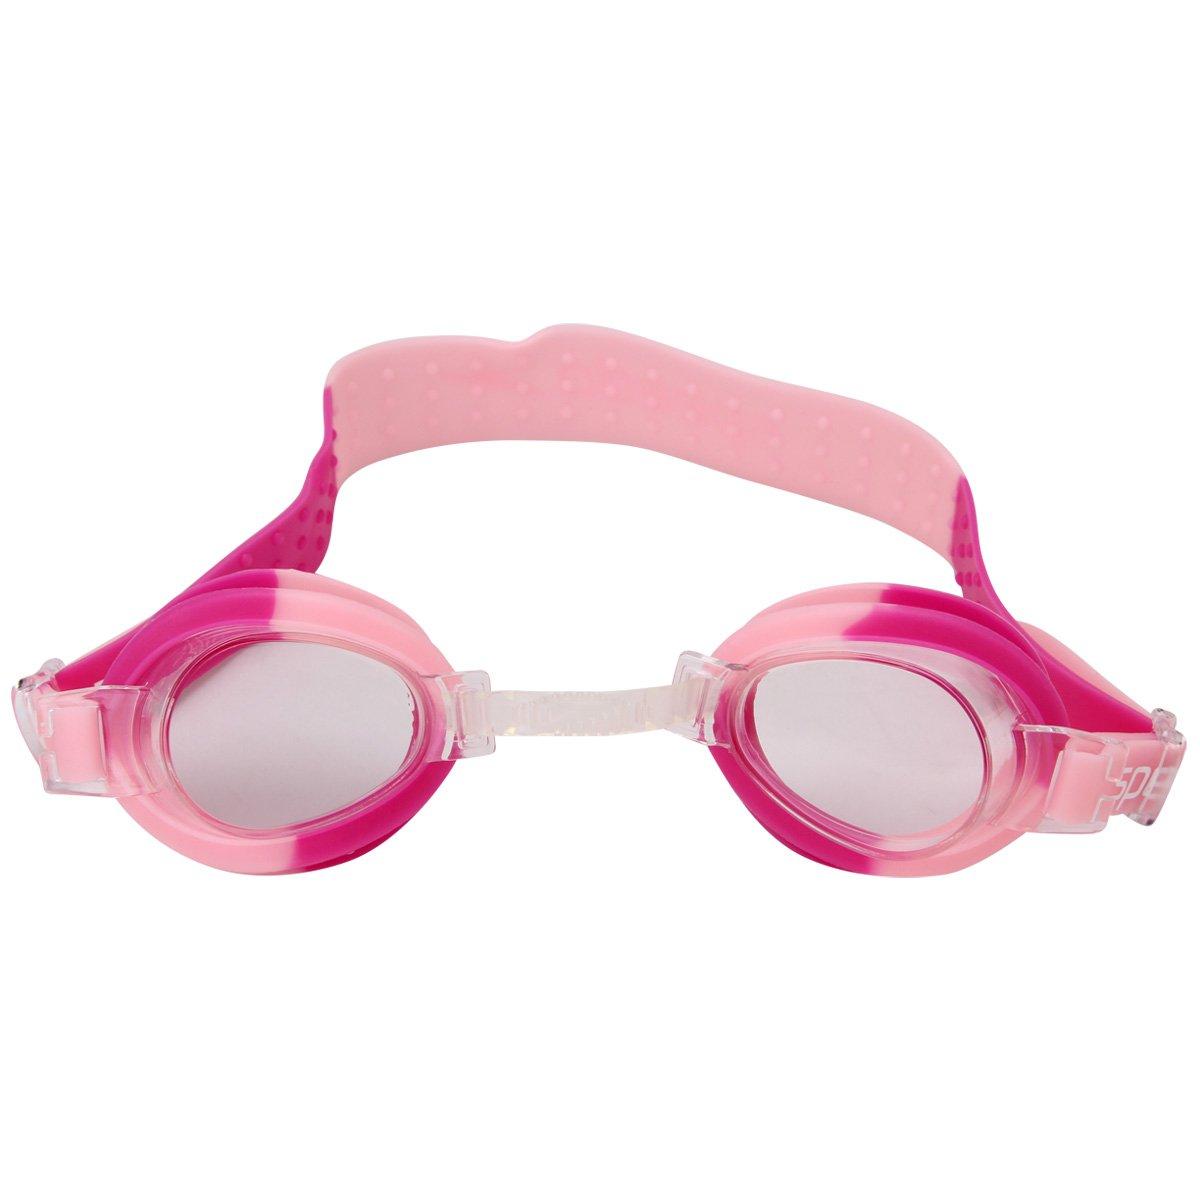 cd8f9466d3 Kit Óculos + Touca Fish Combo - Speedo - Rosa e Vermelho - Compre ...